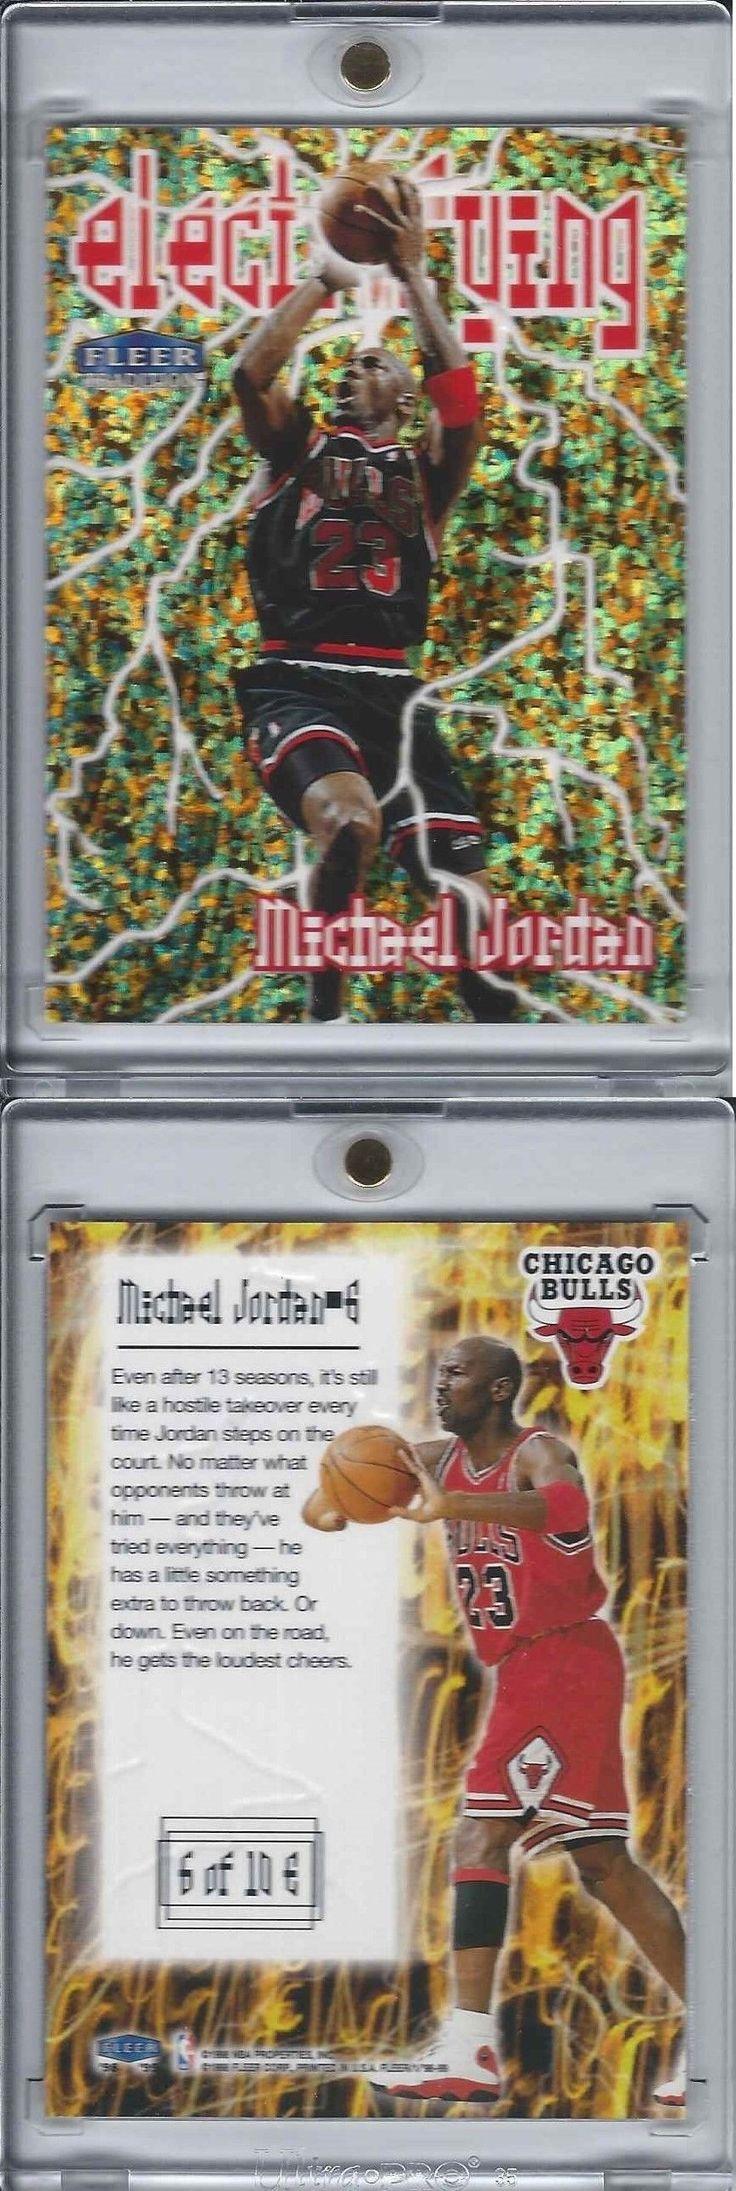 Basketball Cards 214: 1998-99 Fleer Michael Jordan Electrifying Embossed 90 S Insert Bulls Underrated! -> BUY IT NOW ONLY: $299.95 on eBay!